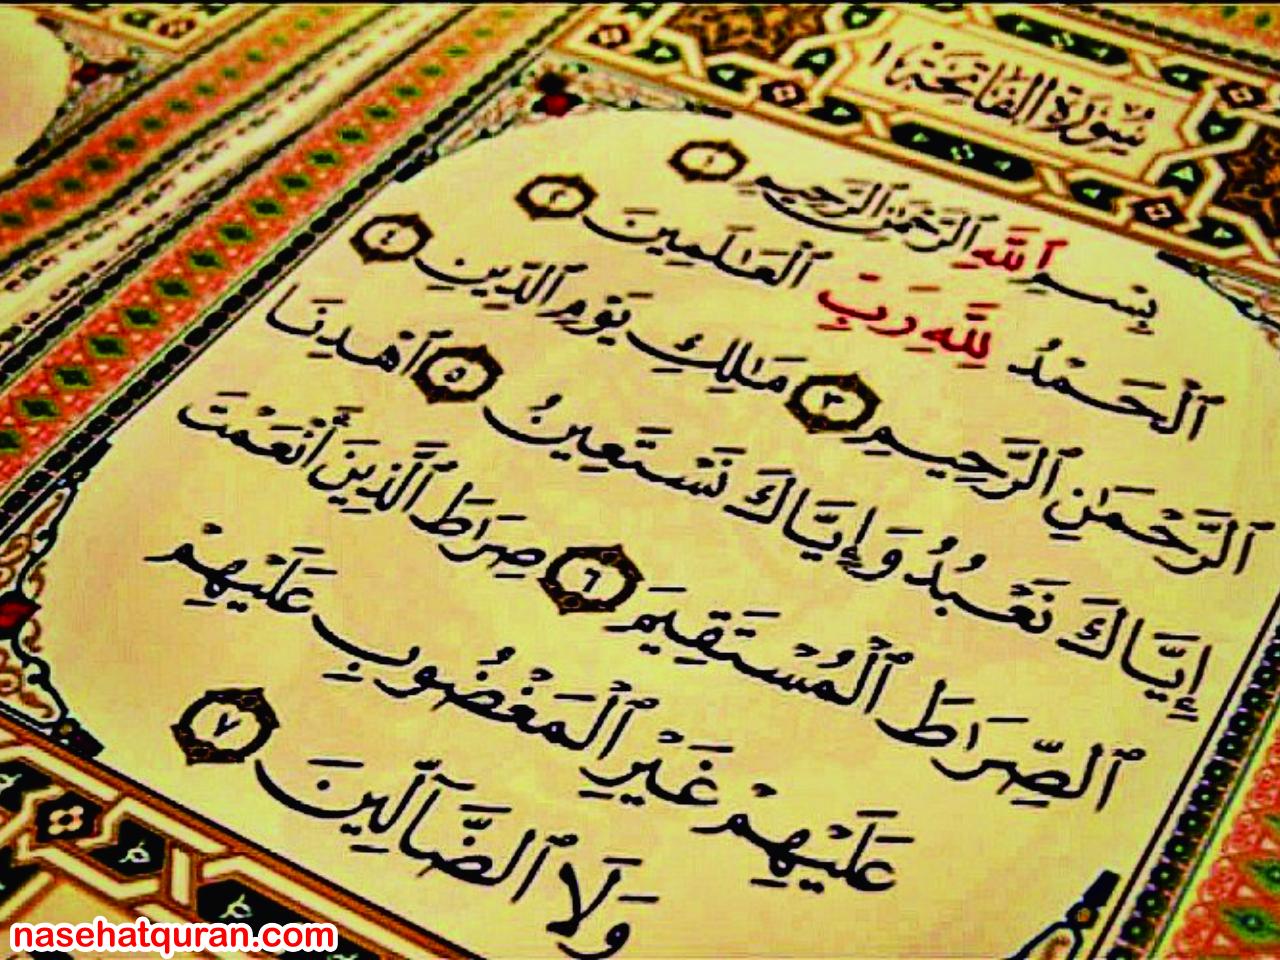 Tafsir Surat Al Fatihah Ayat 1 7 Nasehat Quran